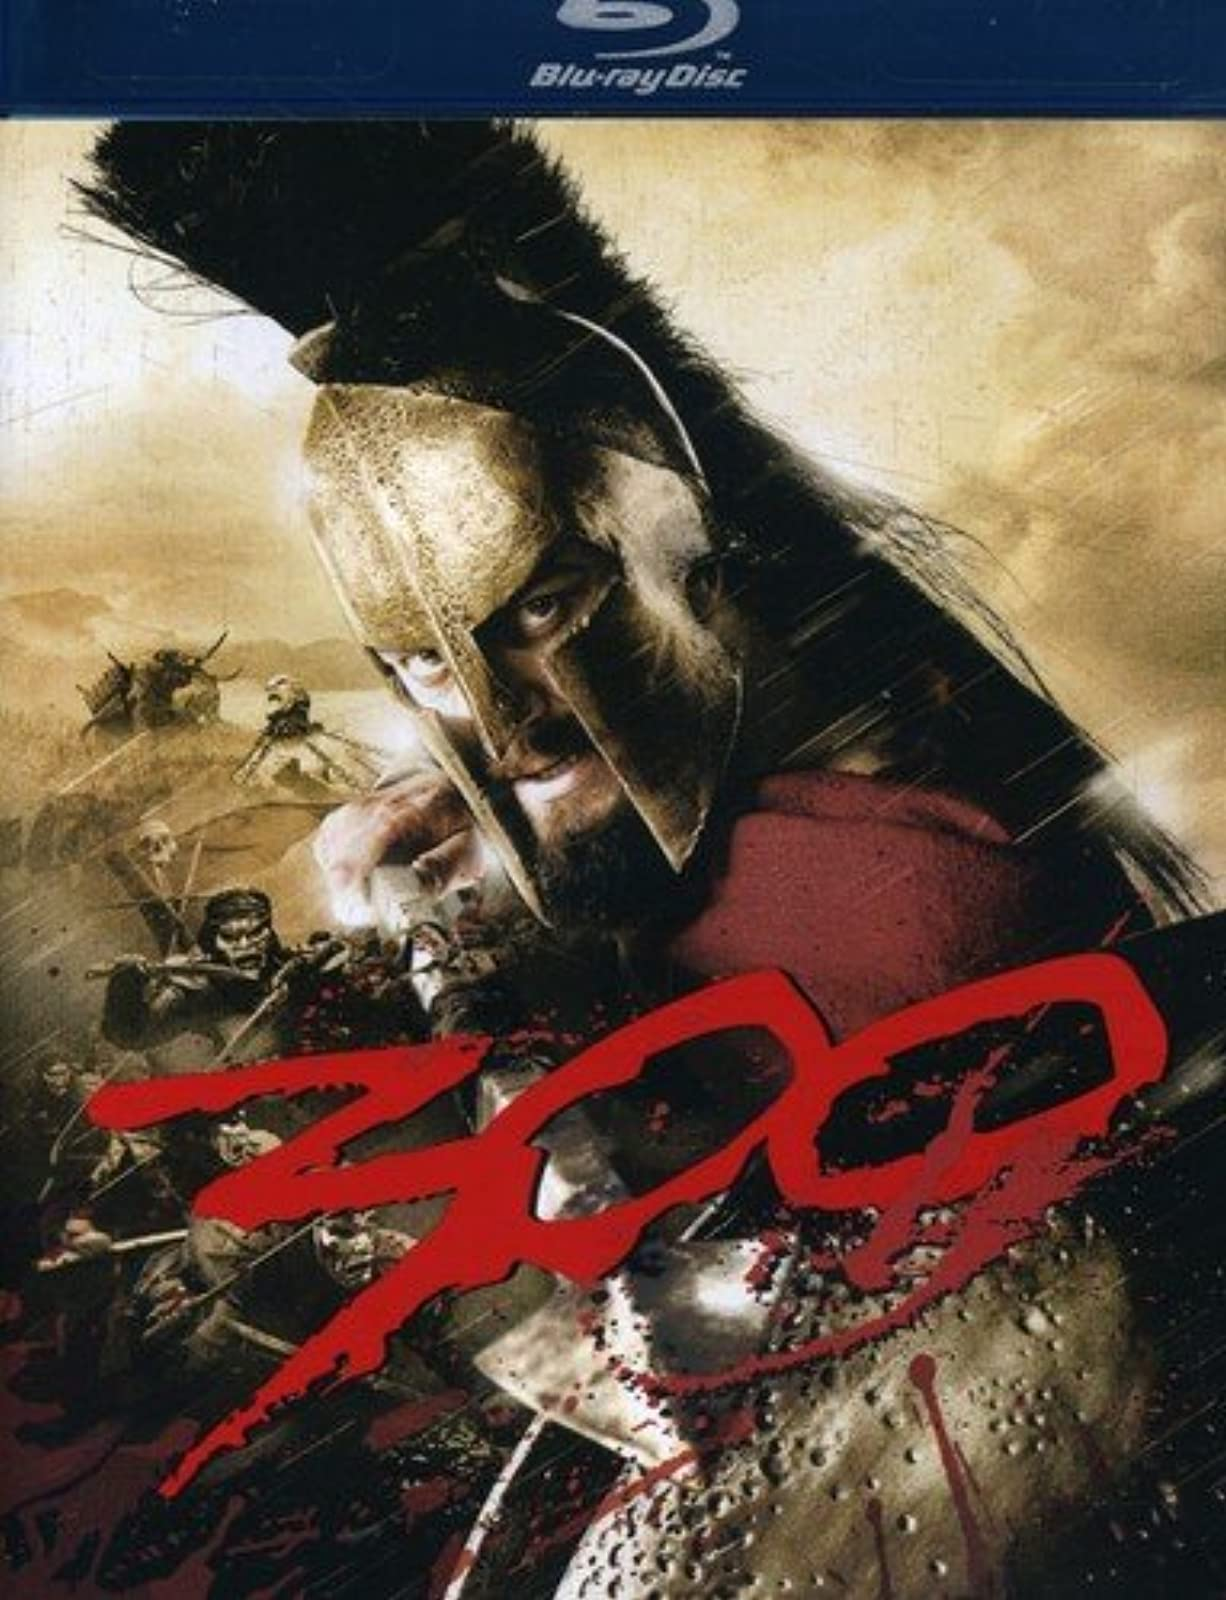 300 Blu-Ray On Blu-Ray With Gerard Butler